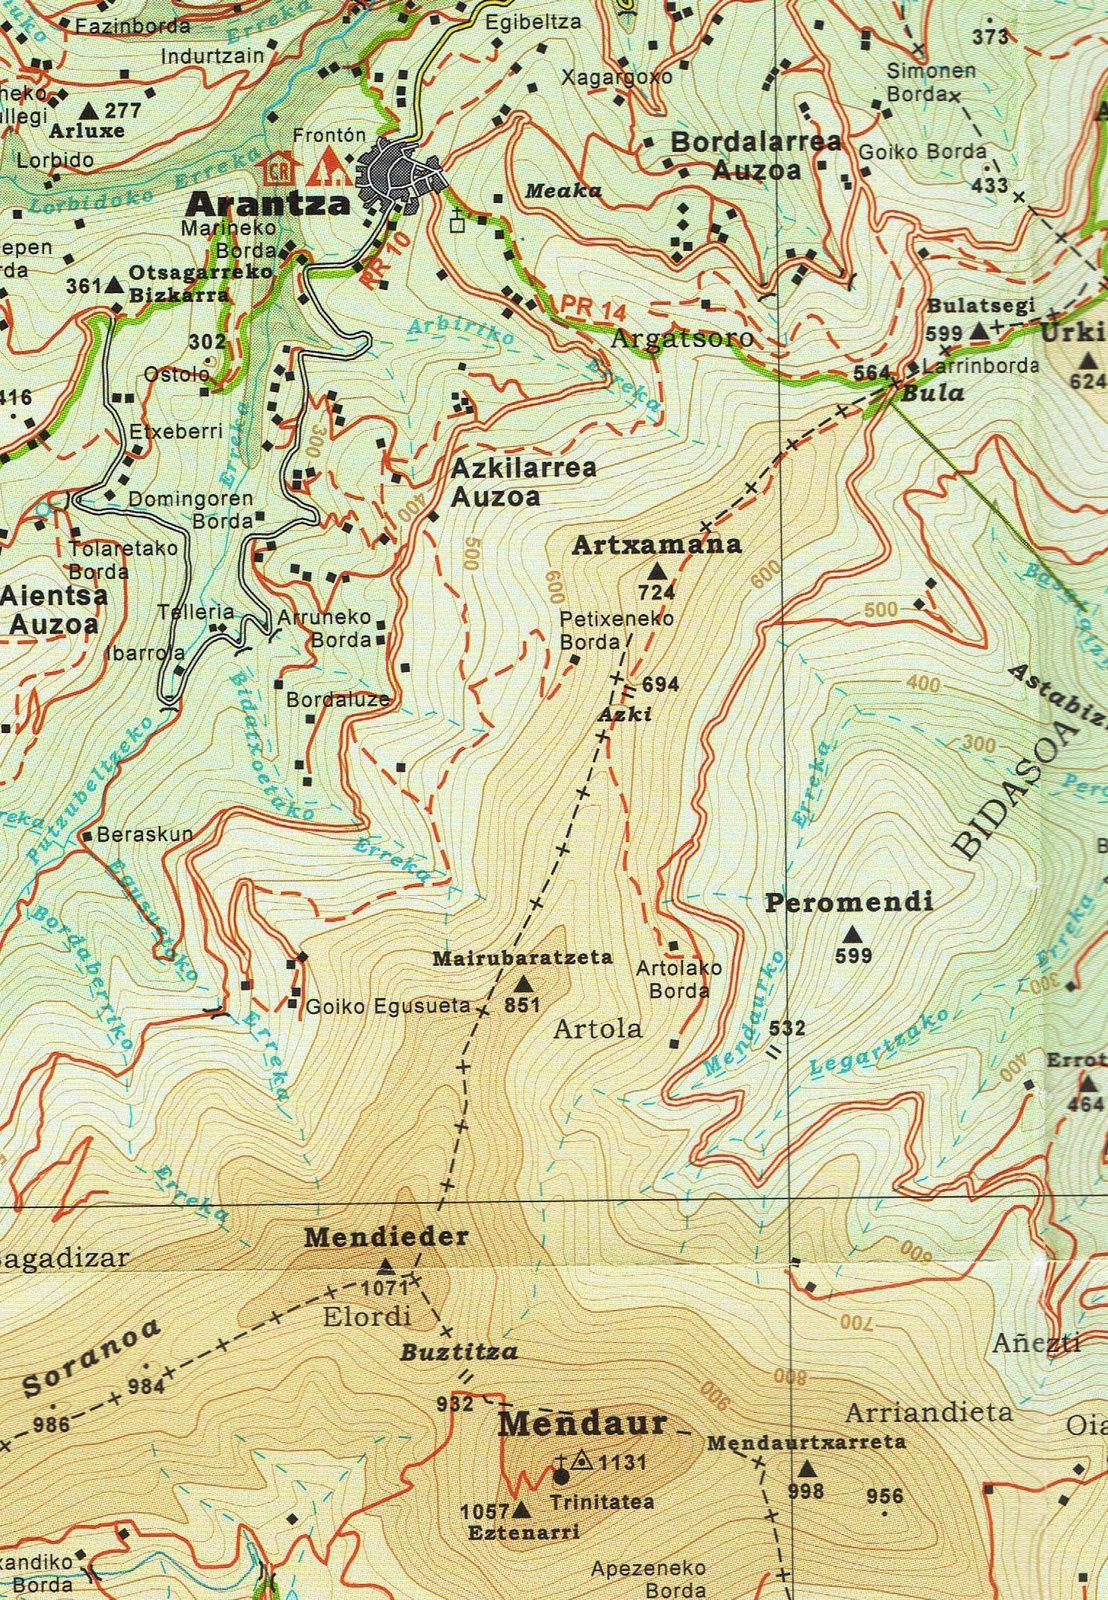 MENDAUR ( 1131 m ) depuis Arantza. 09 octobre 2017.